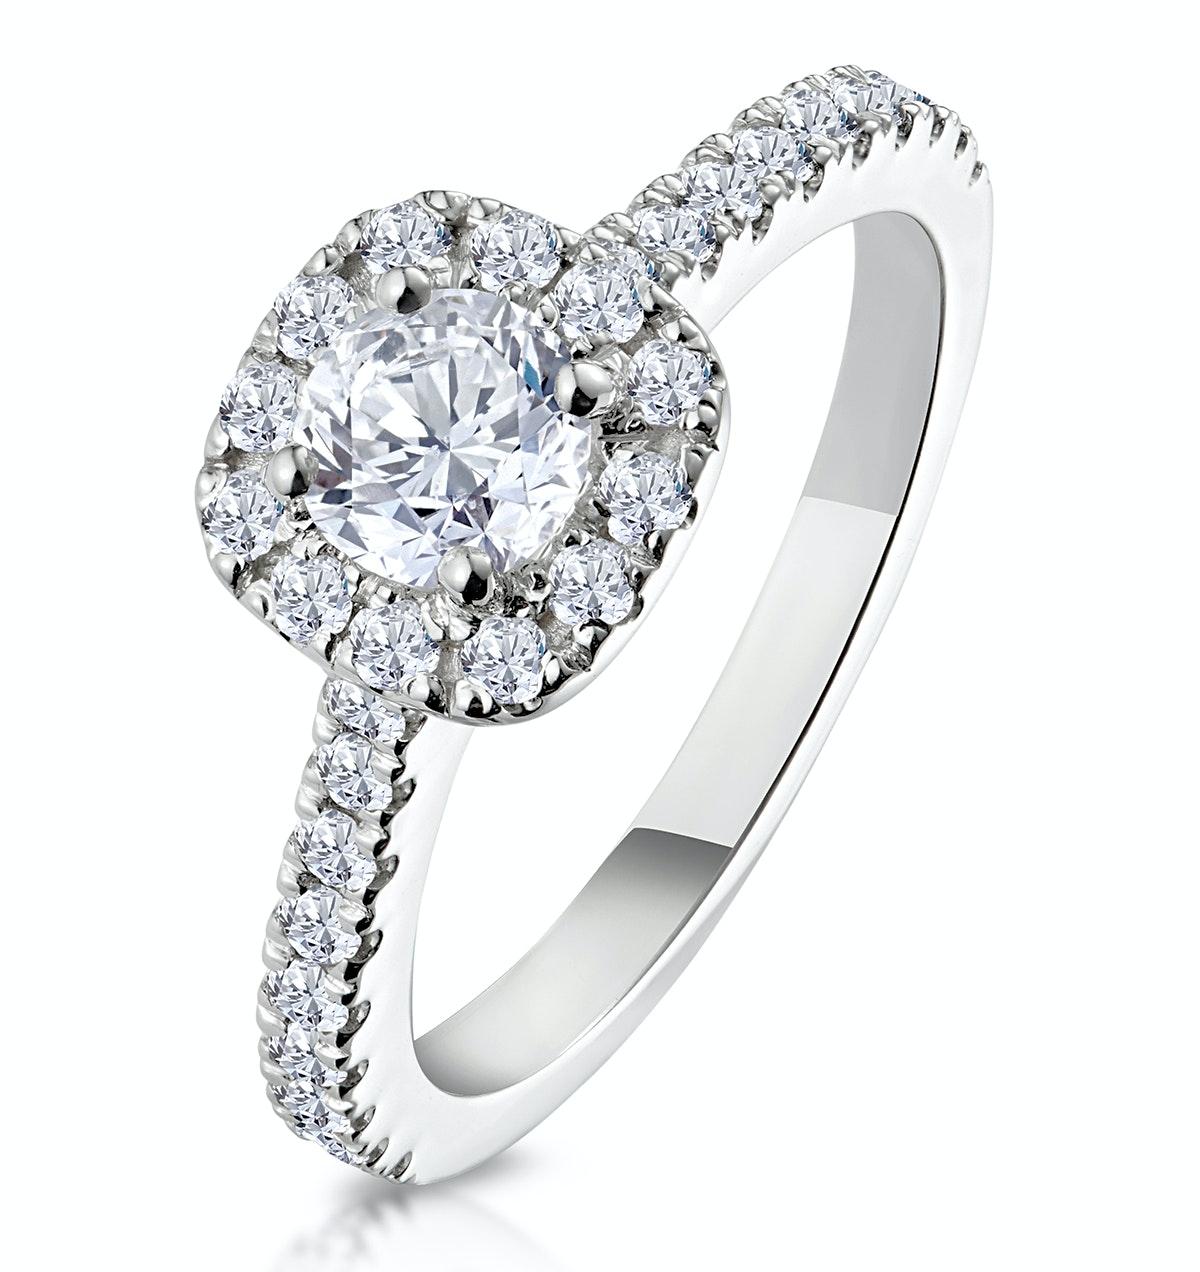 Elizabeth GIA Diamond Halo Engagement Ring 18K White Gold 1.00ct G/SI1